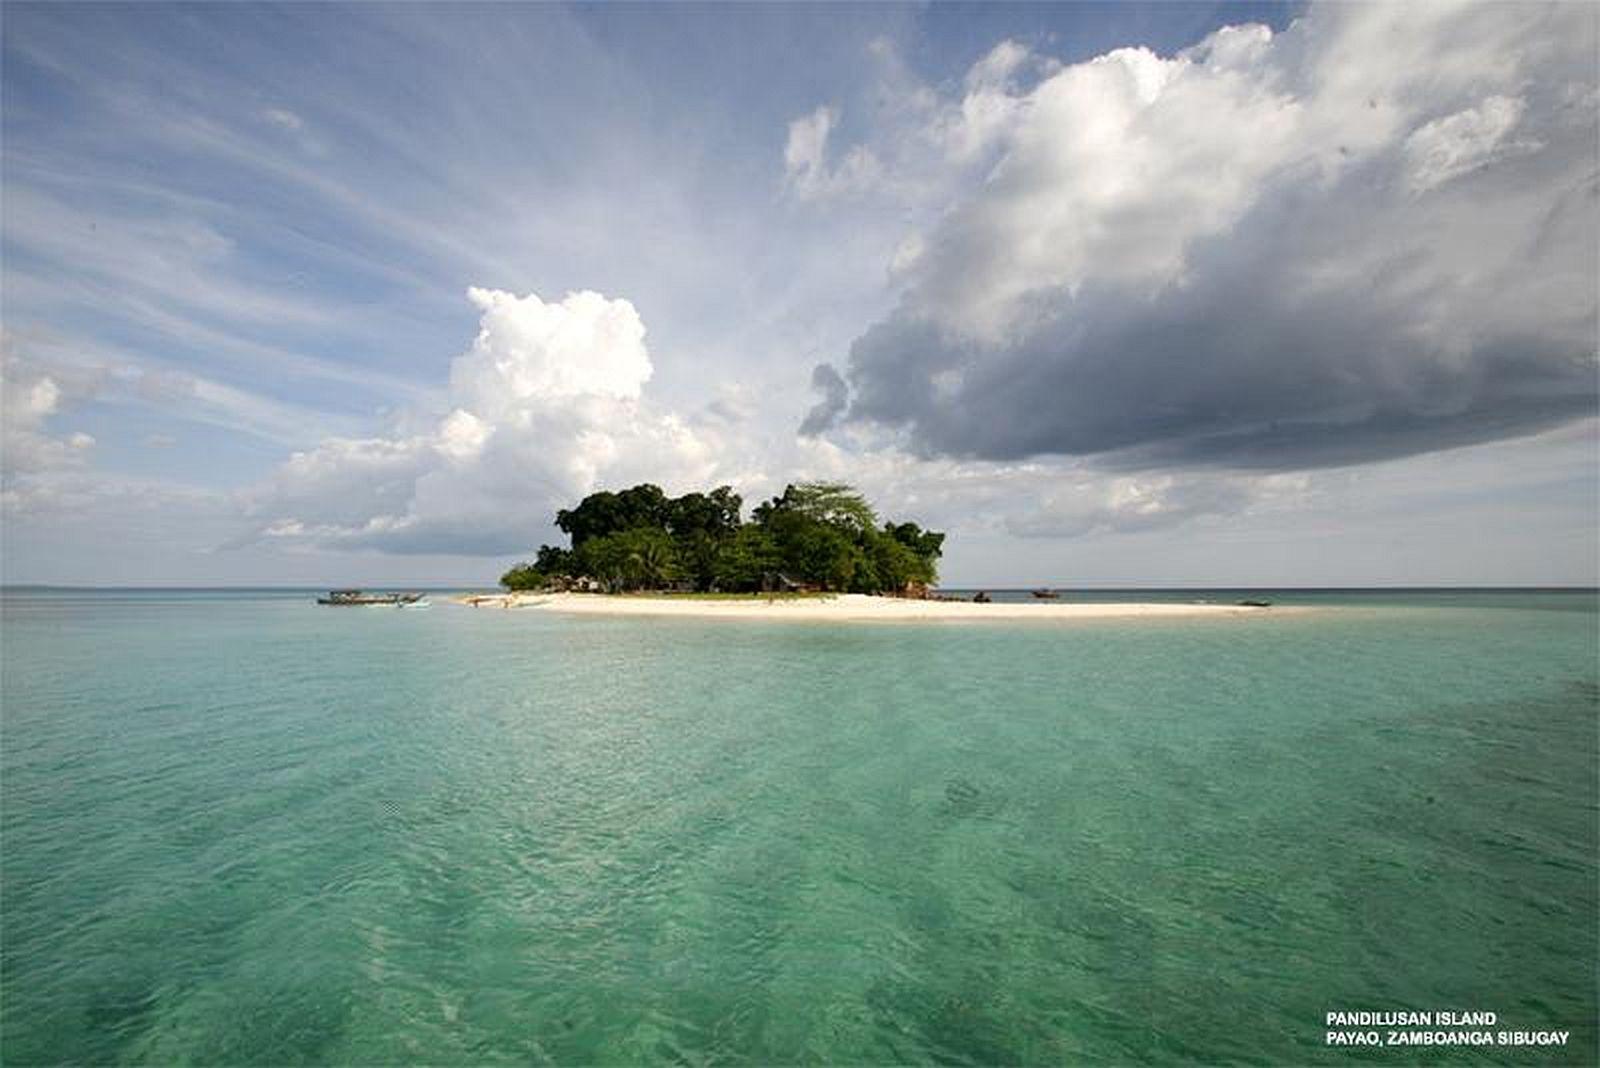 PHILIPPINEN REISEN - ORTE - MINDANAO - Touristische Beschreibung der Provinz Zamboanga Sibugay